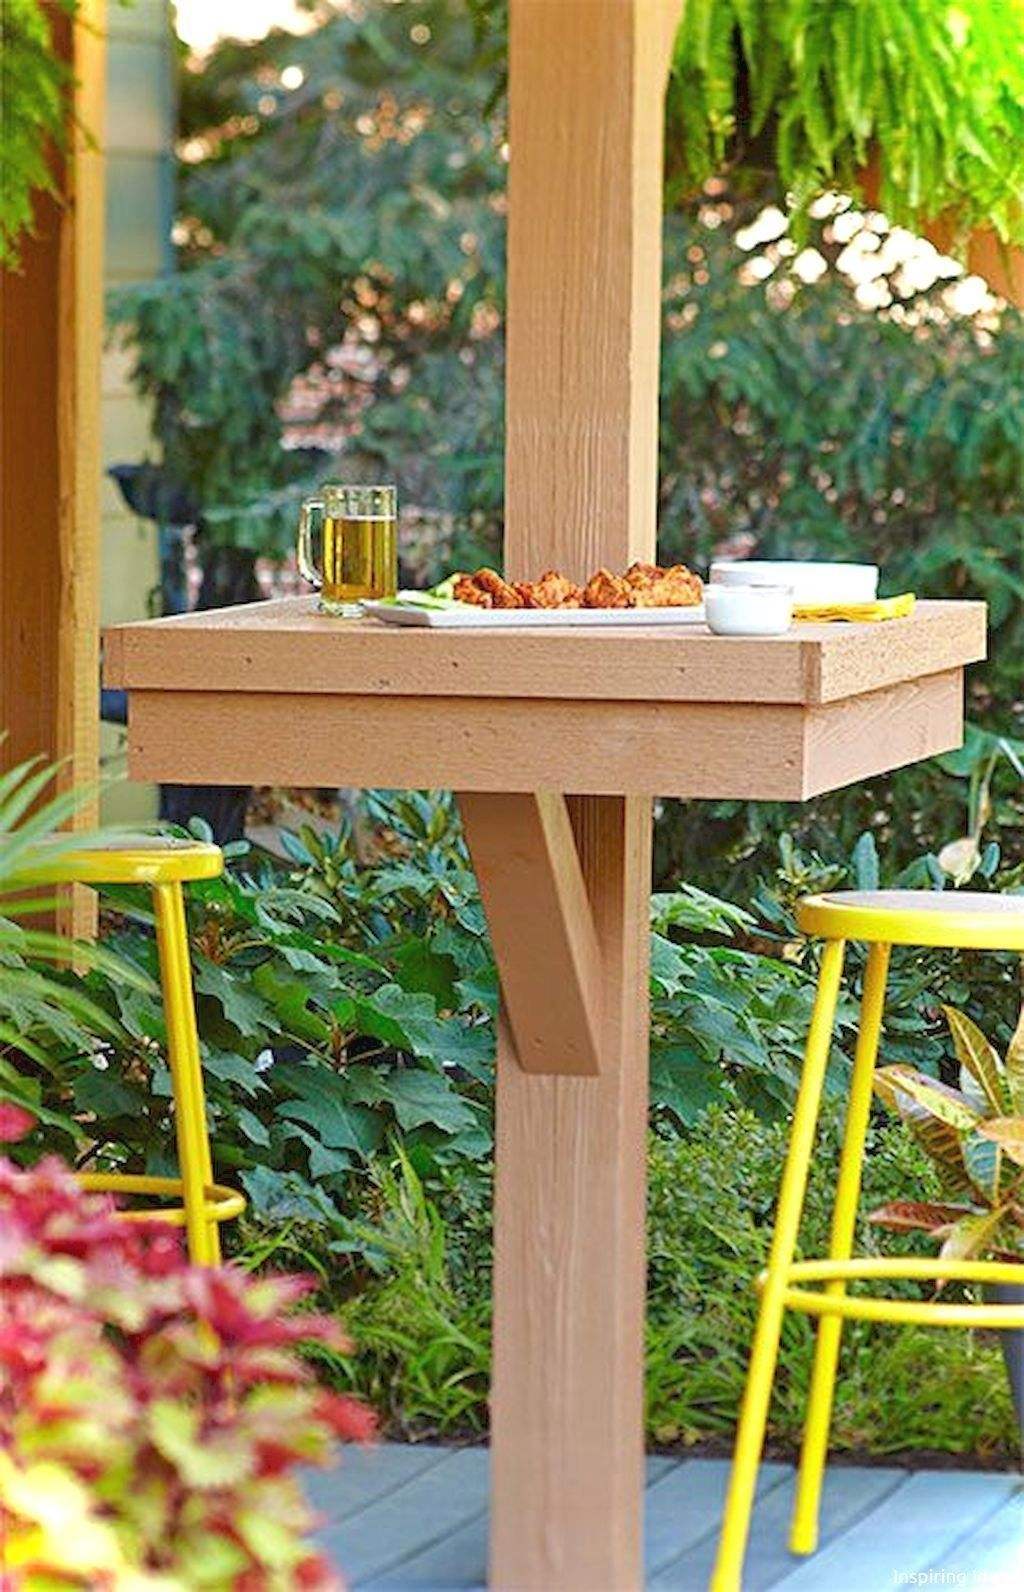 20+ Amazing Cheap Patio Furniture Ideas | Diy patio ... on Diy Backyard Patio Cheap  id=46746